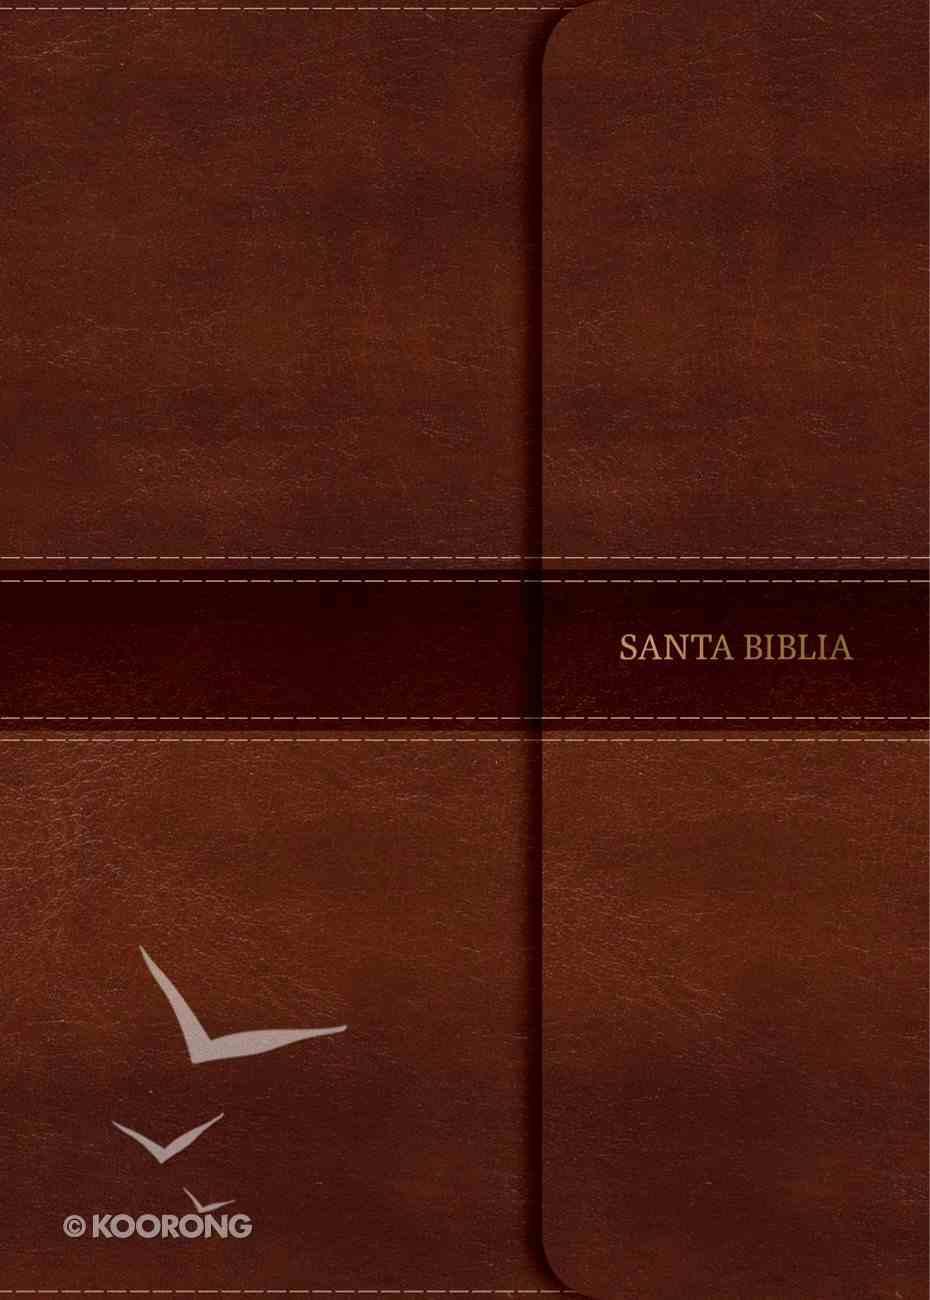 Rvr 1960 Biblia Compacta Letra Grande Marron Solapa Con Iman (Red Letter Edition) (Large Print Magnetic Flap) Imitation Leather